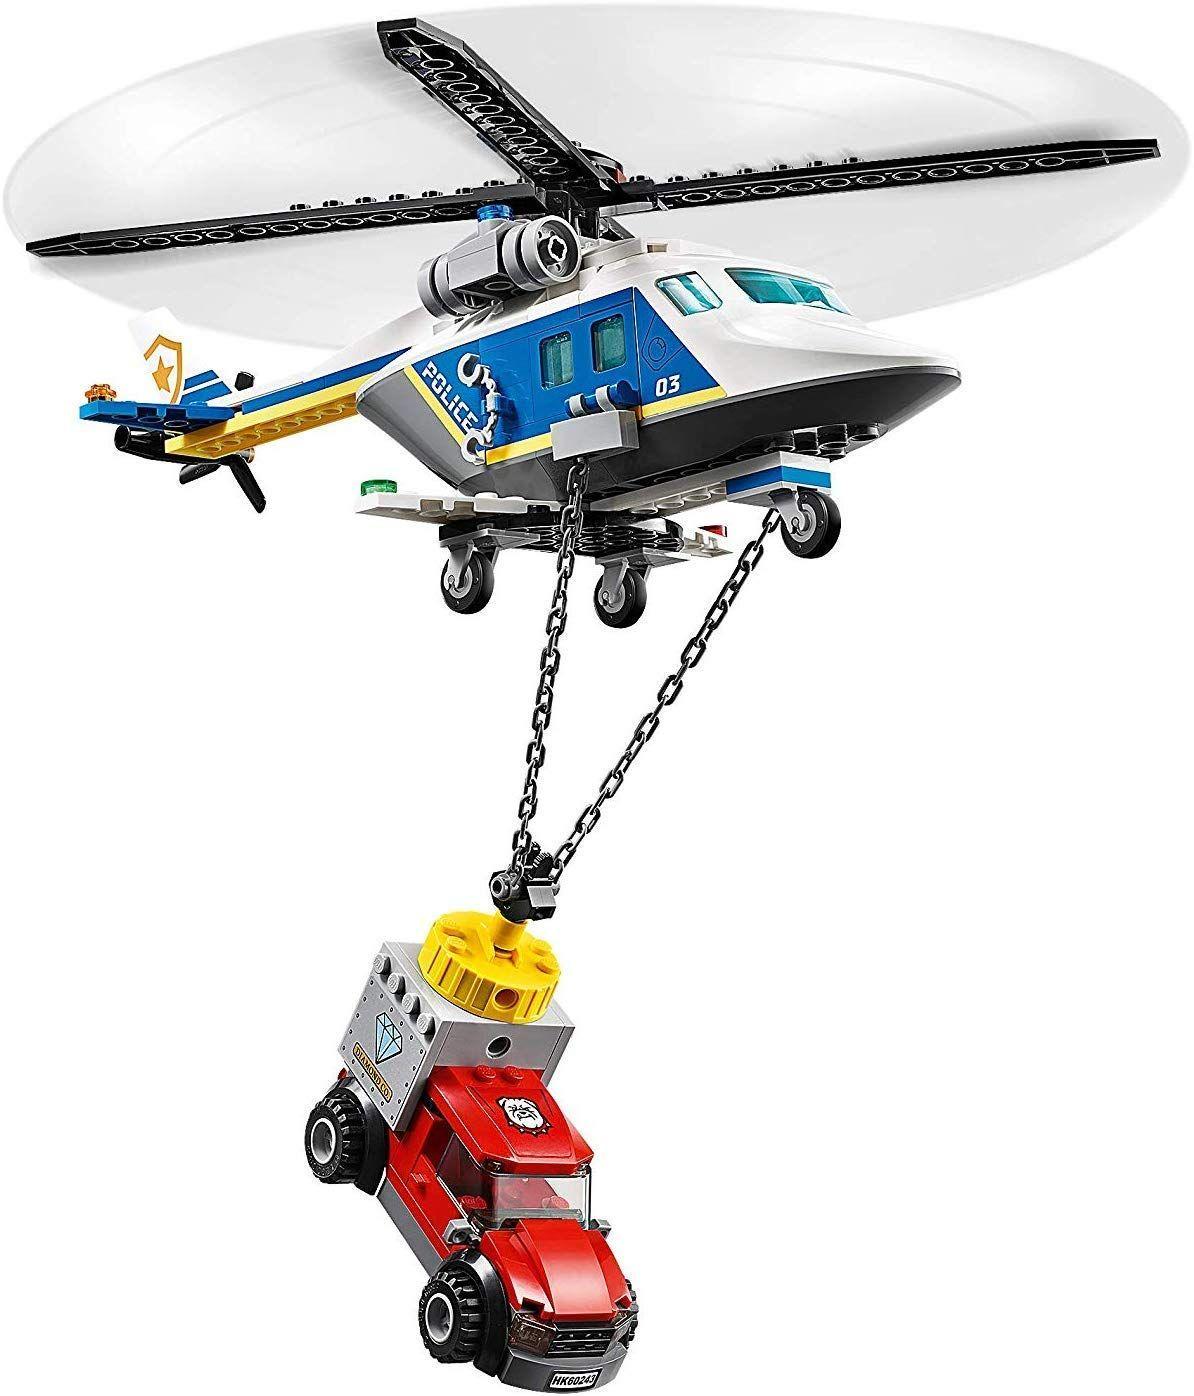 Конструктор Lego City Police - Полицейско преследване с хеликоптер (60243) - 7